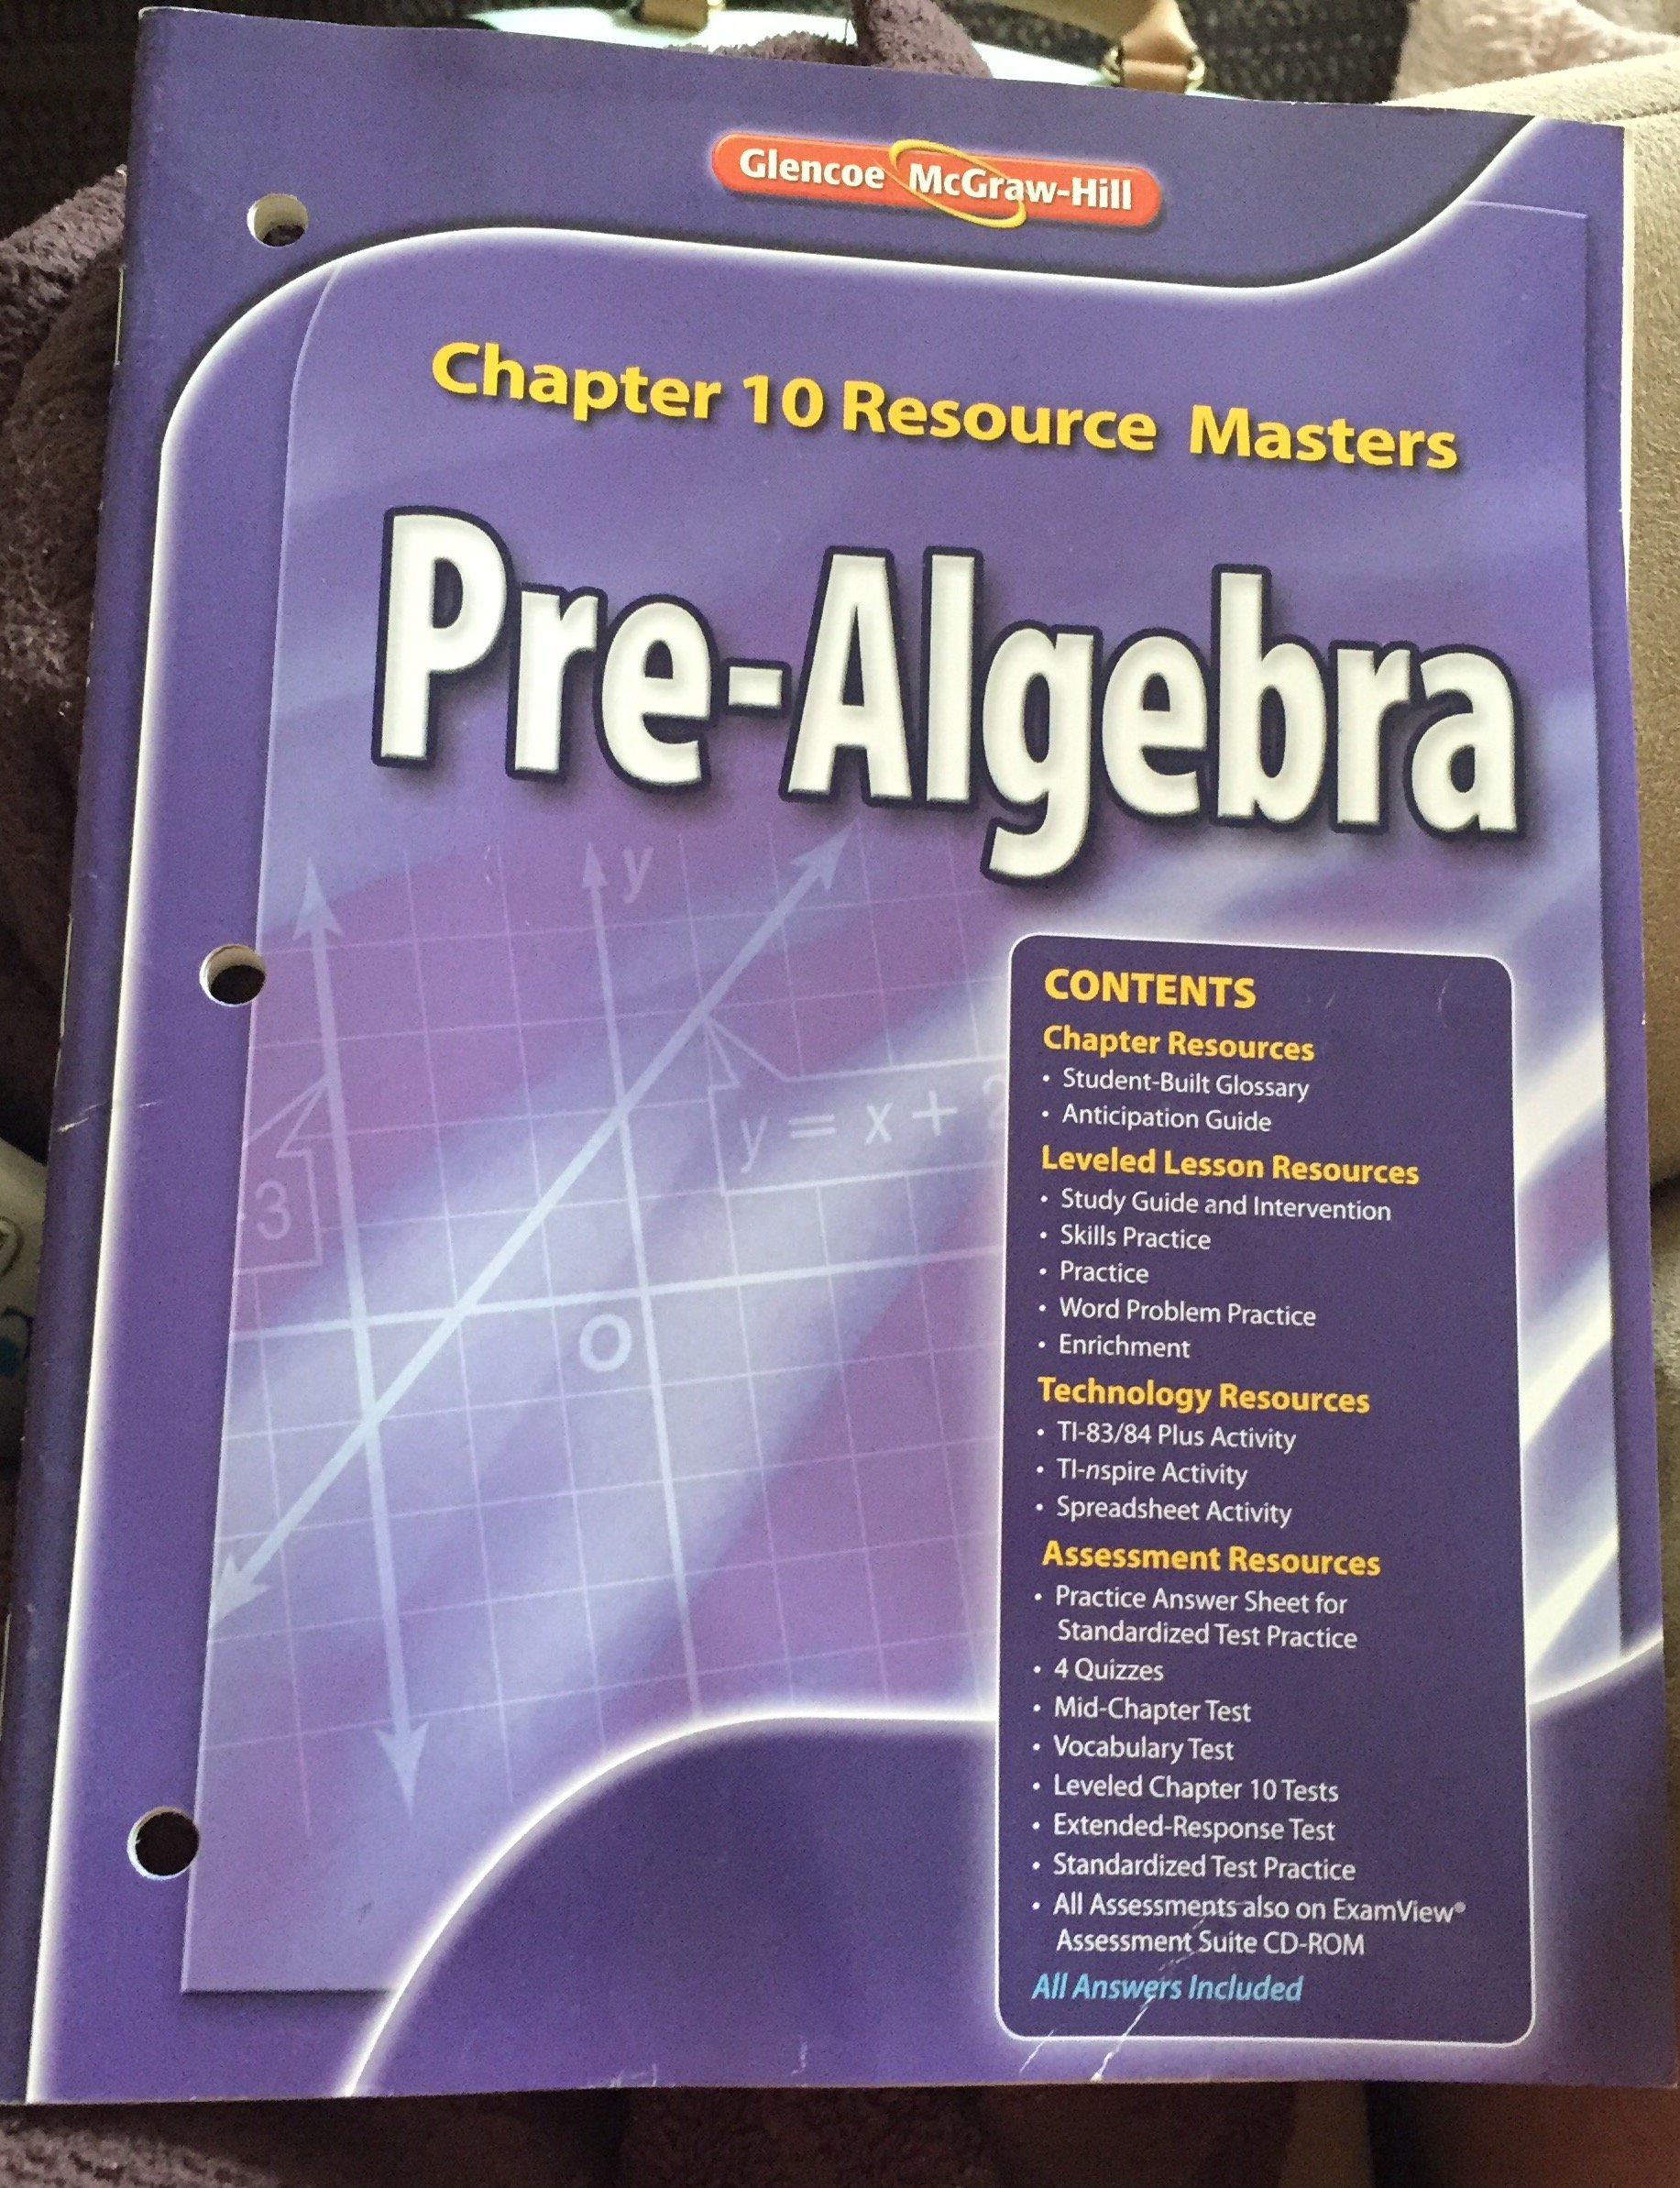 Glencoe Pre-Algebra Chapter 10 Resource Masters